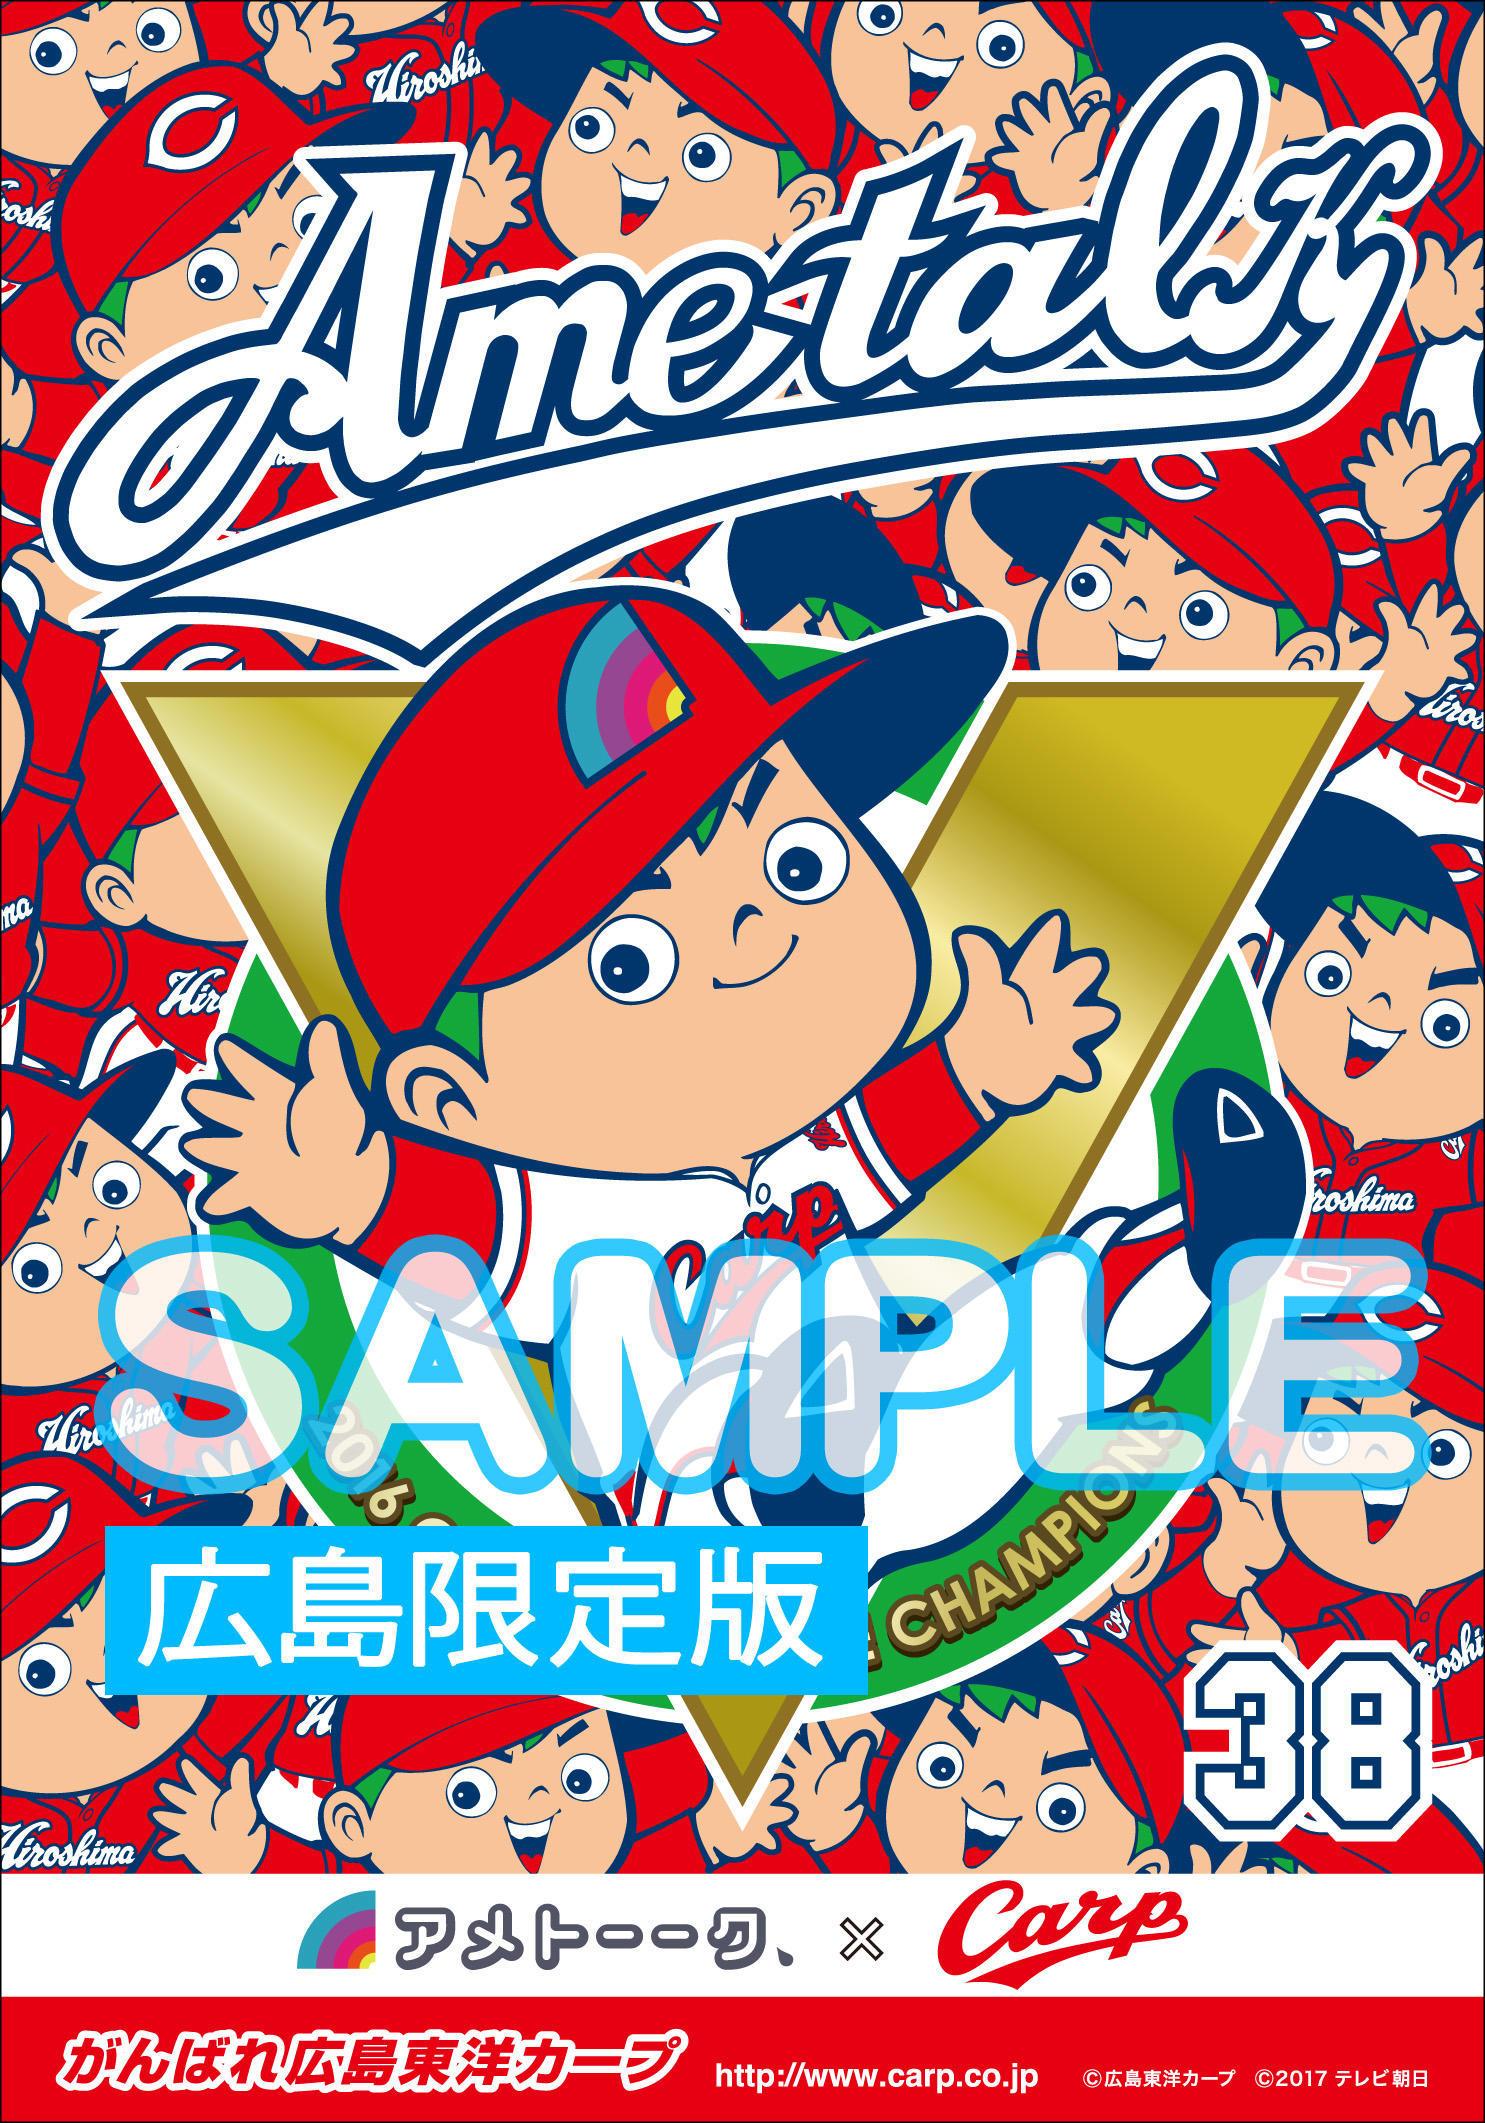 http://news.yoshimoto.co.jp/20170306113515-c24983f9e23fe1d337bfa9c8c8be1e3731cb4074.jpg